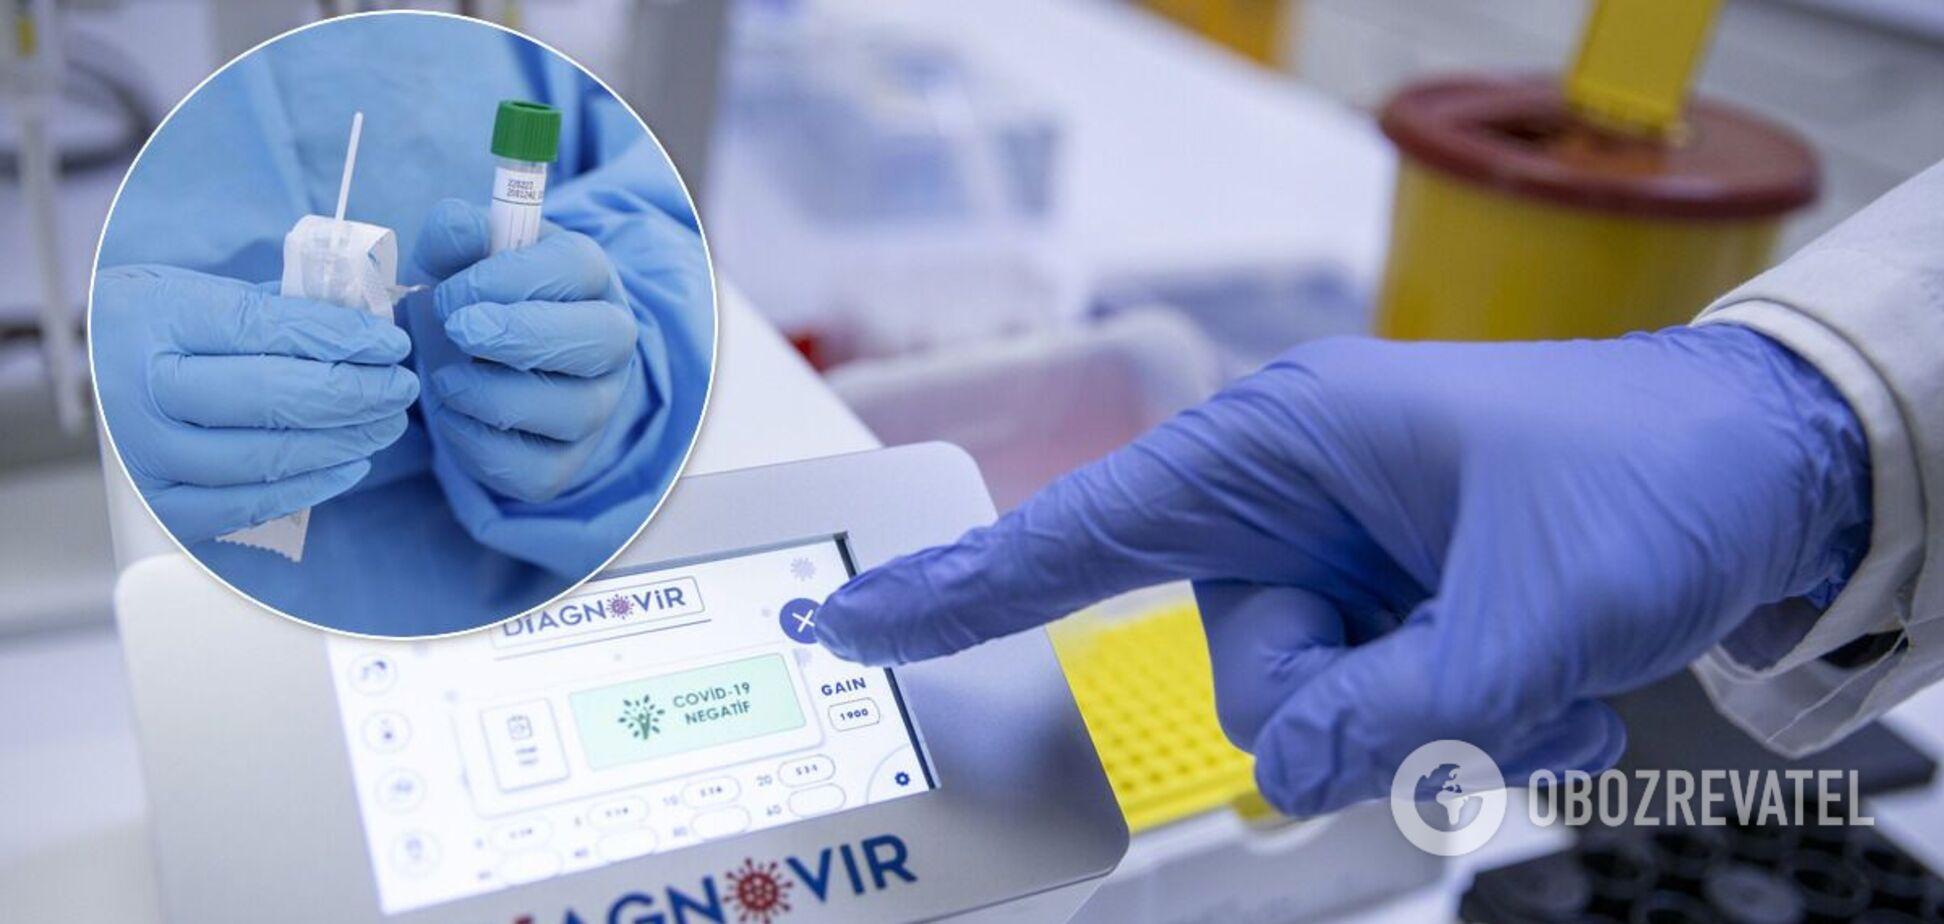 В Турции создали прибор для диагностики COVID-19 вместо ПЦР-тестов